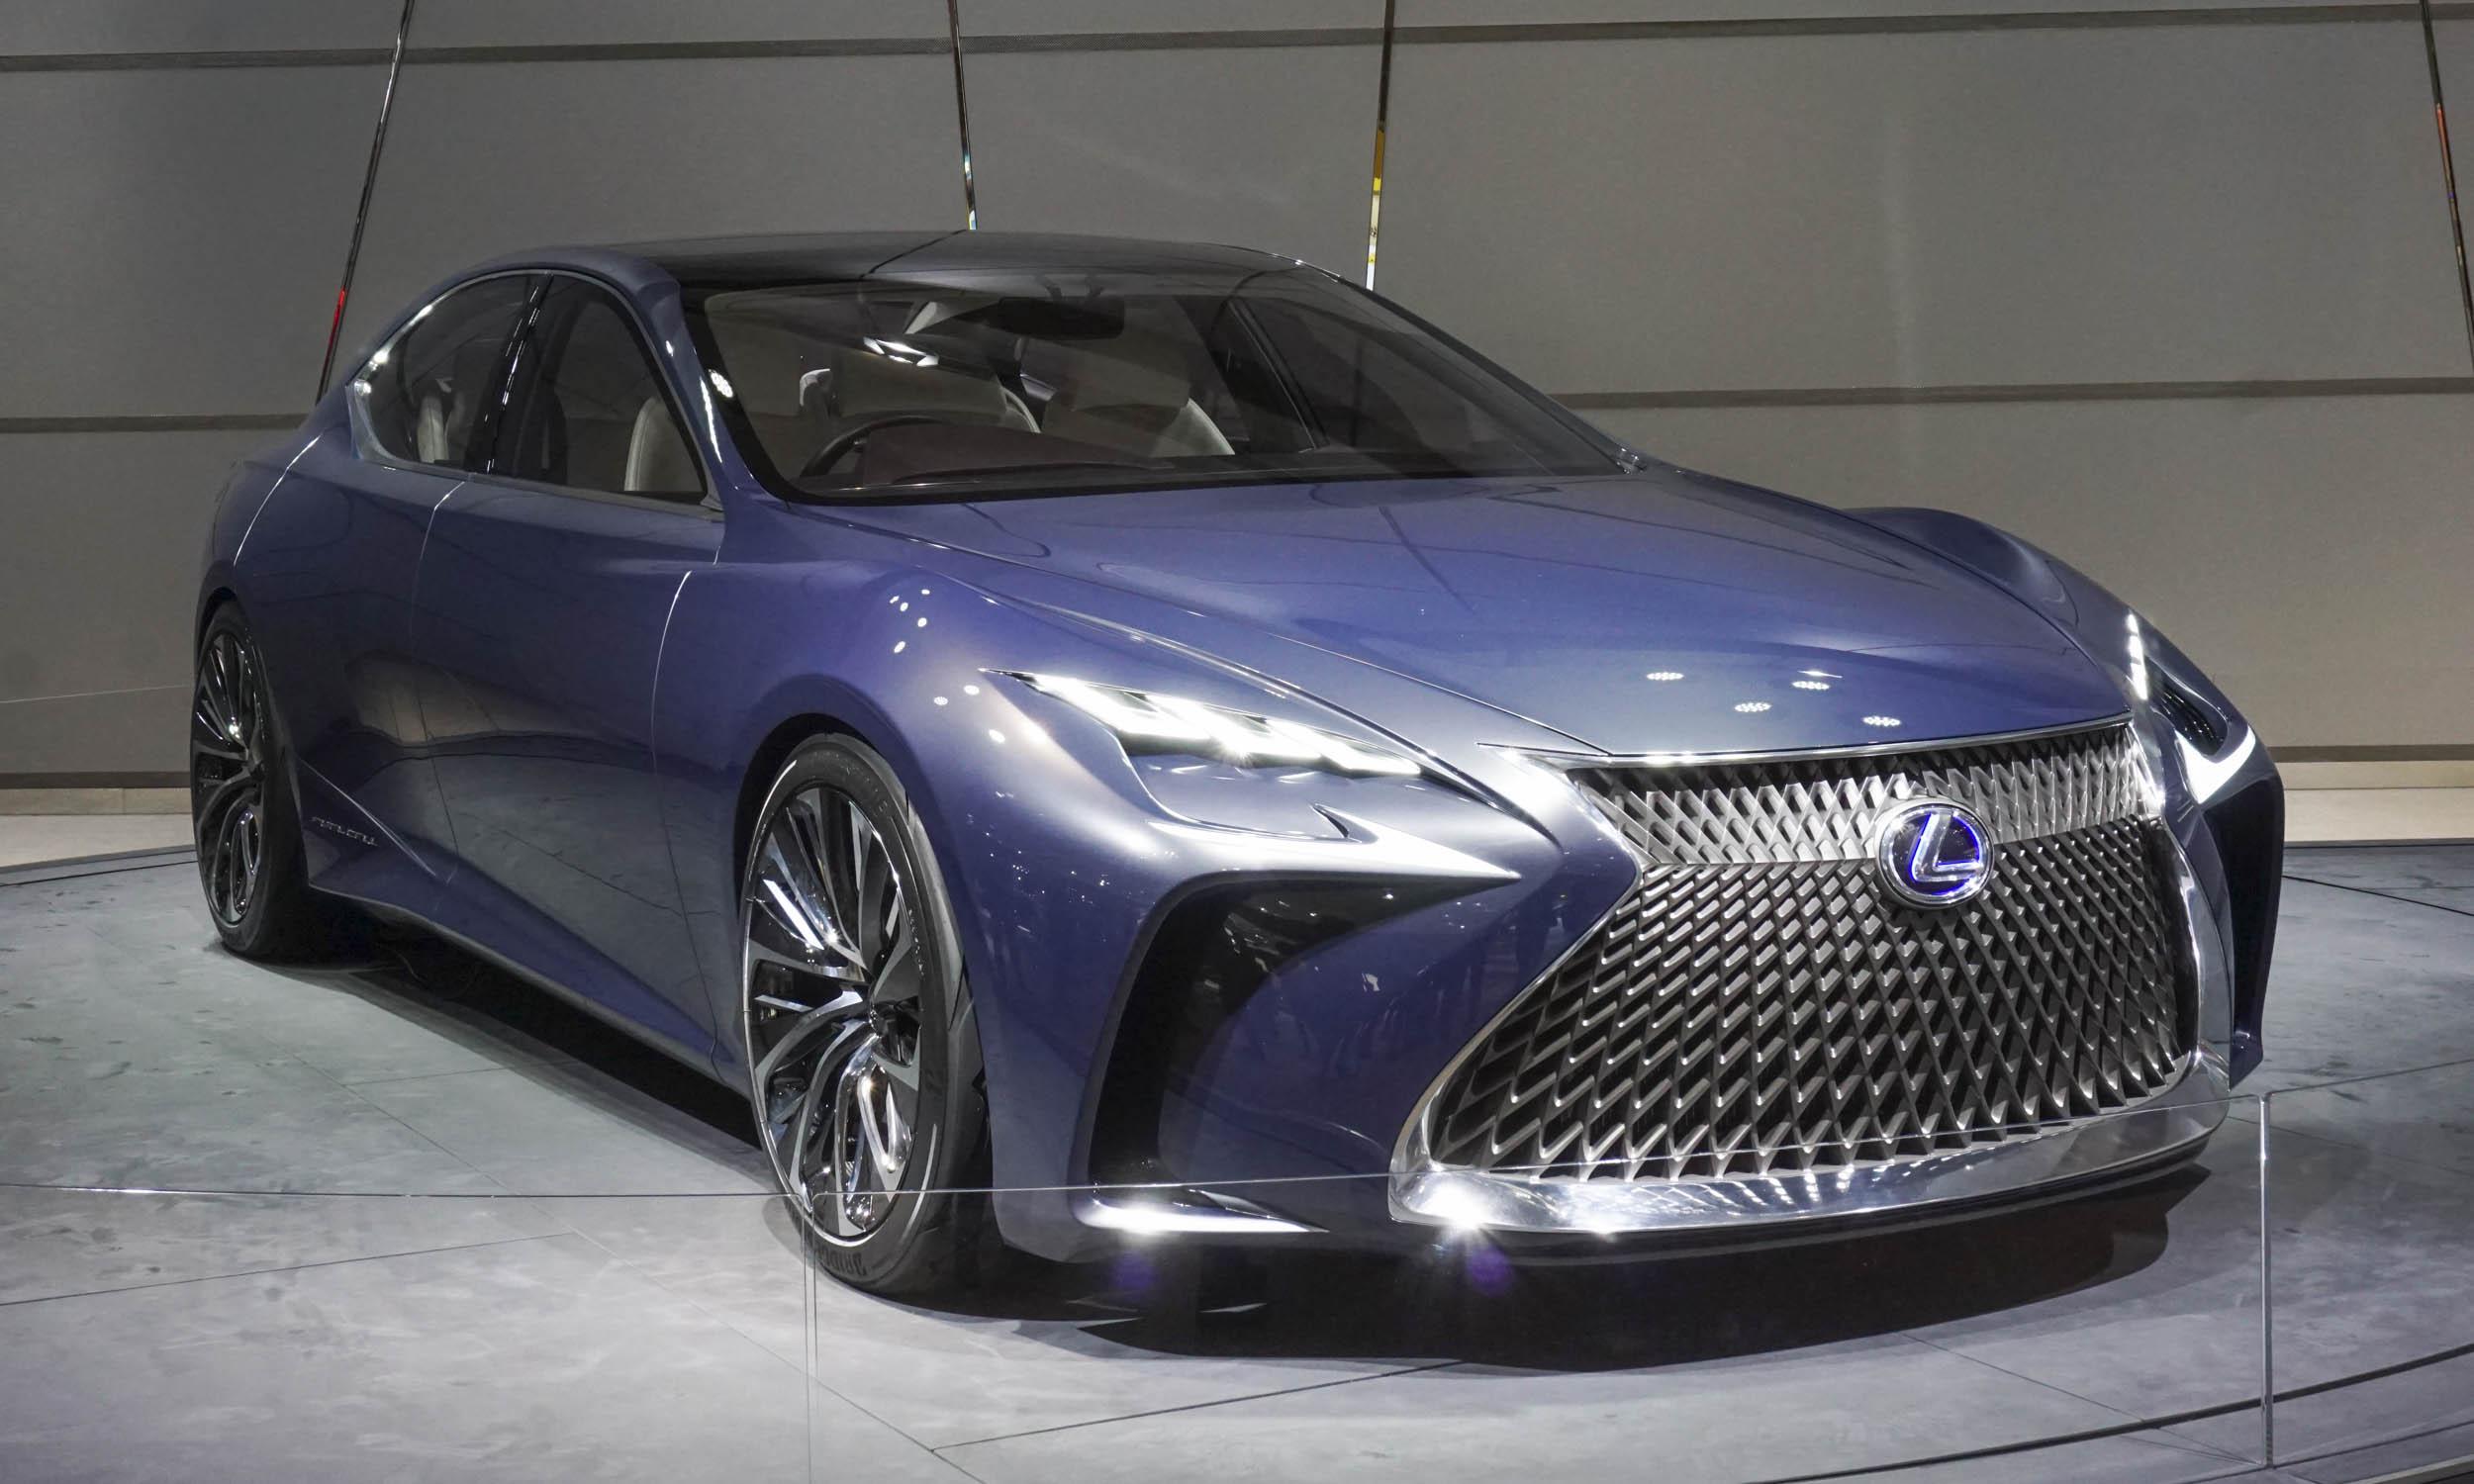 http://autonxt.net/wp-content/uploads/2015/10/Lexus-LF-FC-Concept1.jpg